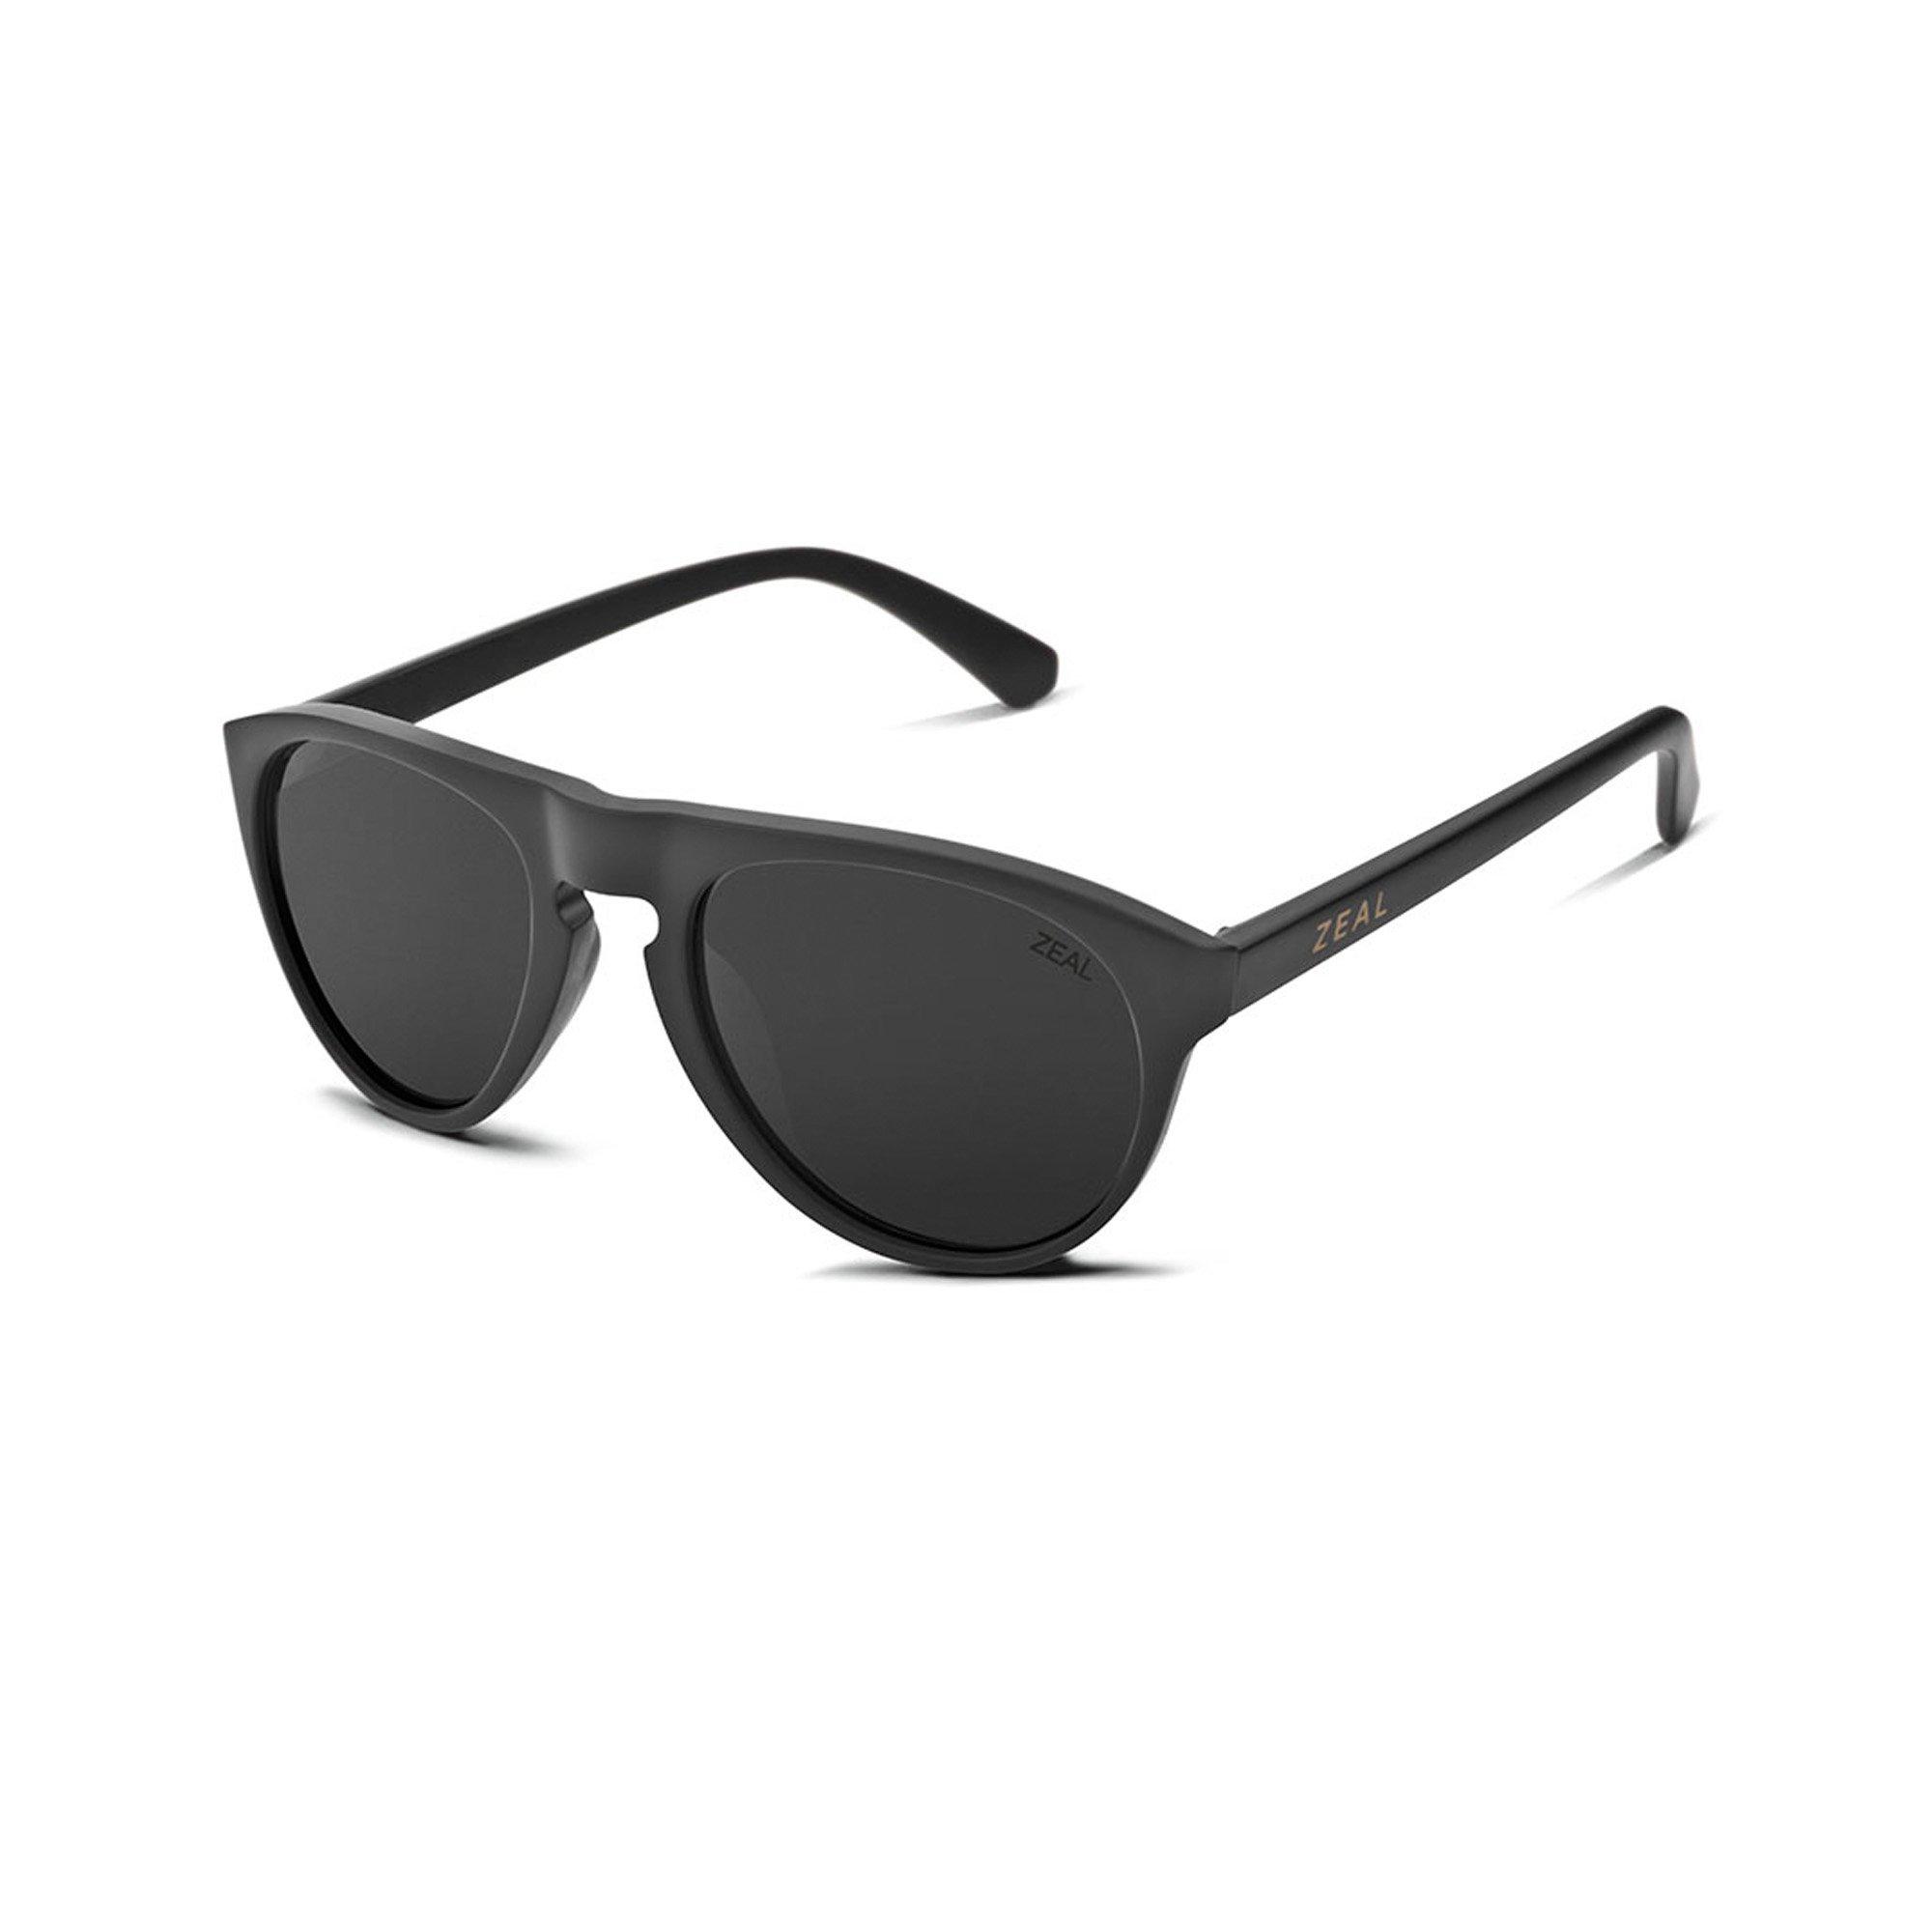 Zeal Optics Unisex Memphis Matte Black W/ Polarized Dark Grey Lens Sunglasses